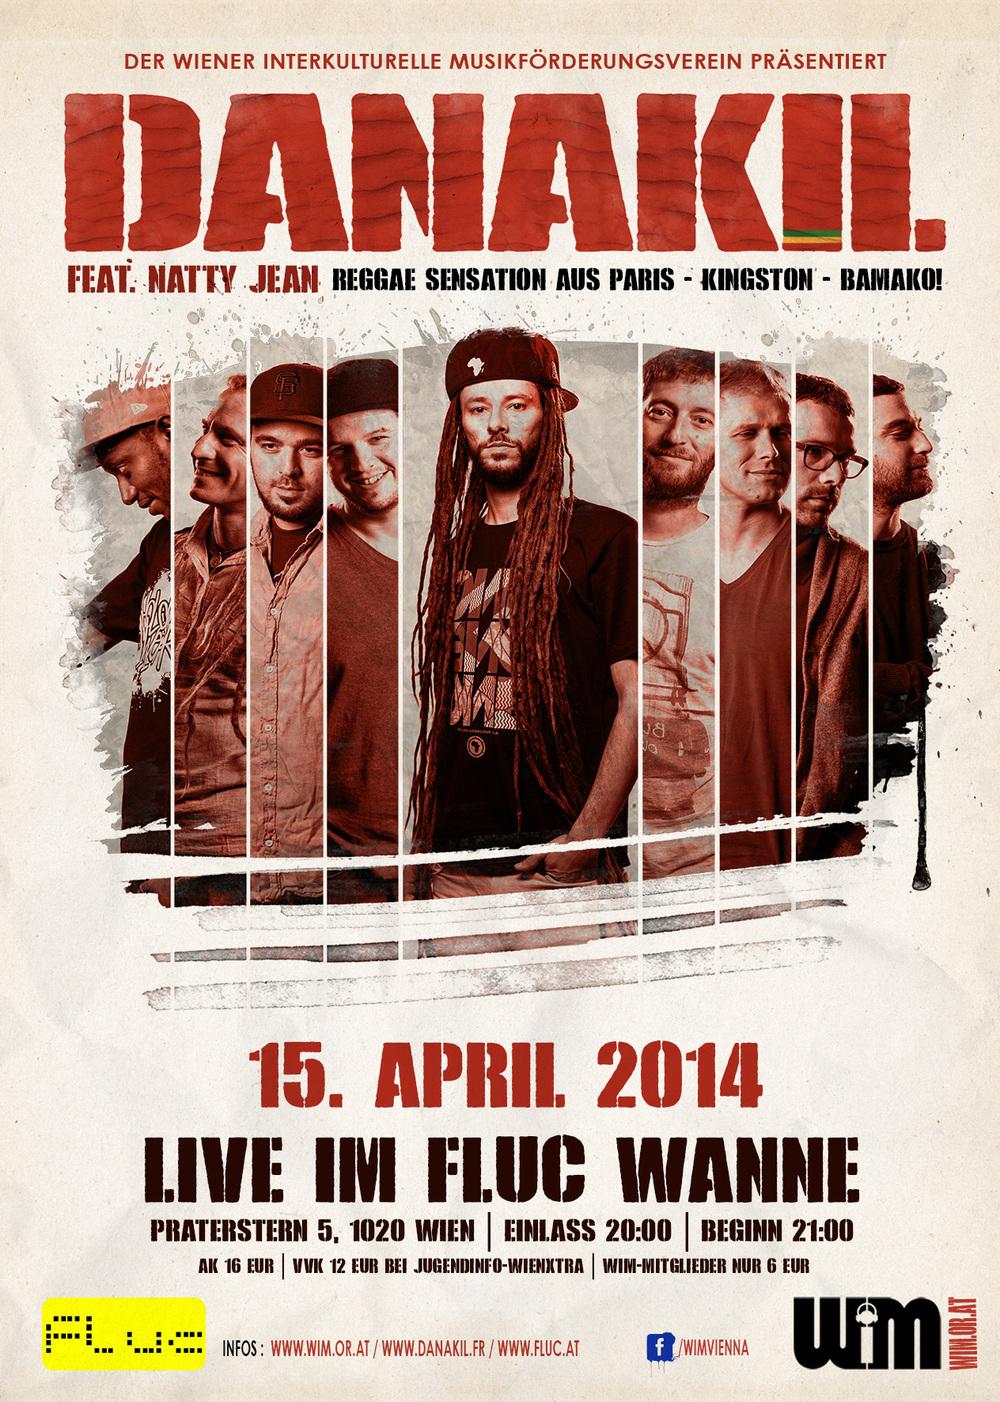 DANAKIL feat NATTY JEAN | FLUC WANNE | VIENNA | 15.04.2014